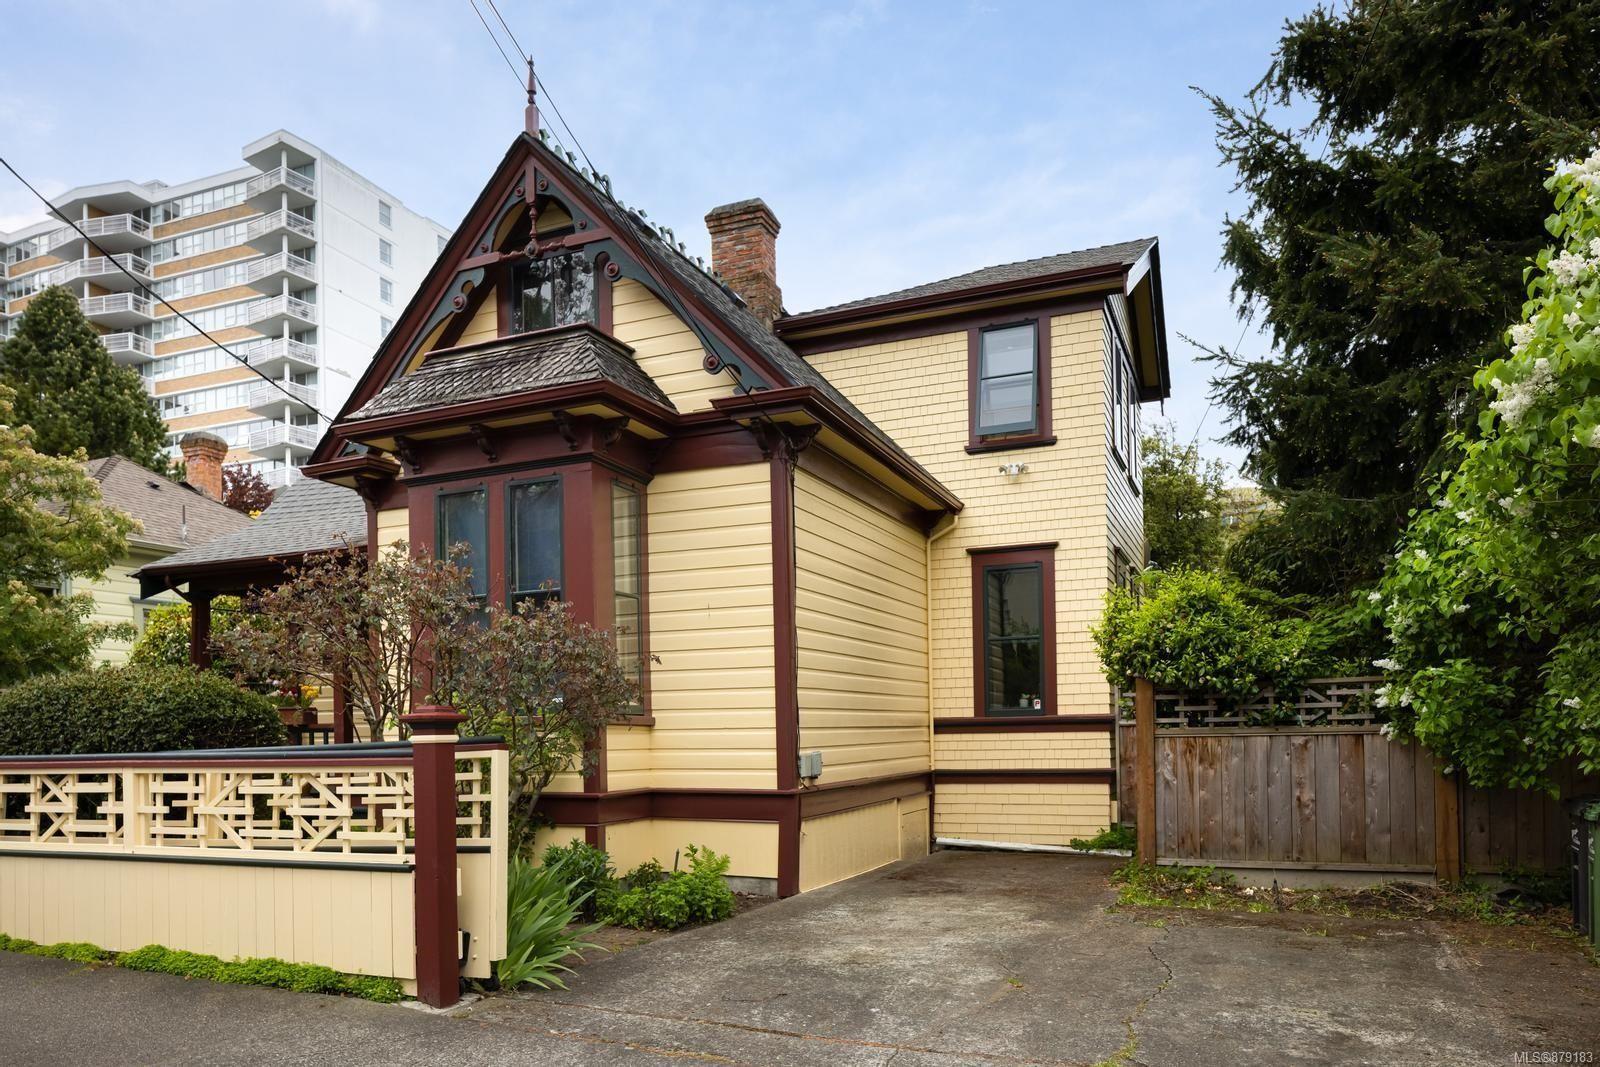 Main Photo: 155 Rendall St in : Vi James Bay Full Duplex for sale (Victoria)  : MLS®# 879183